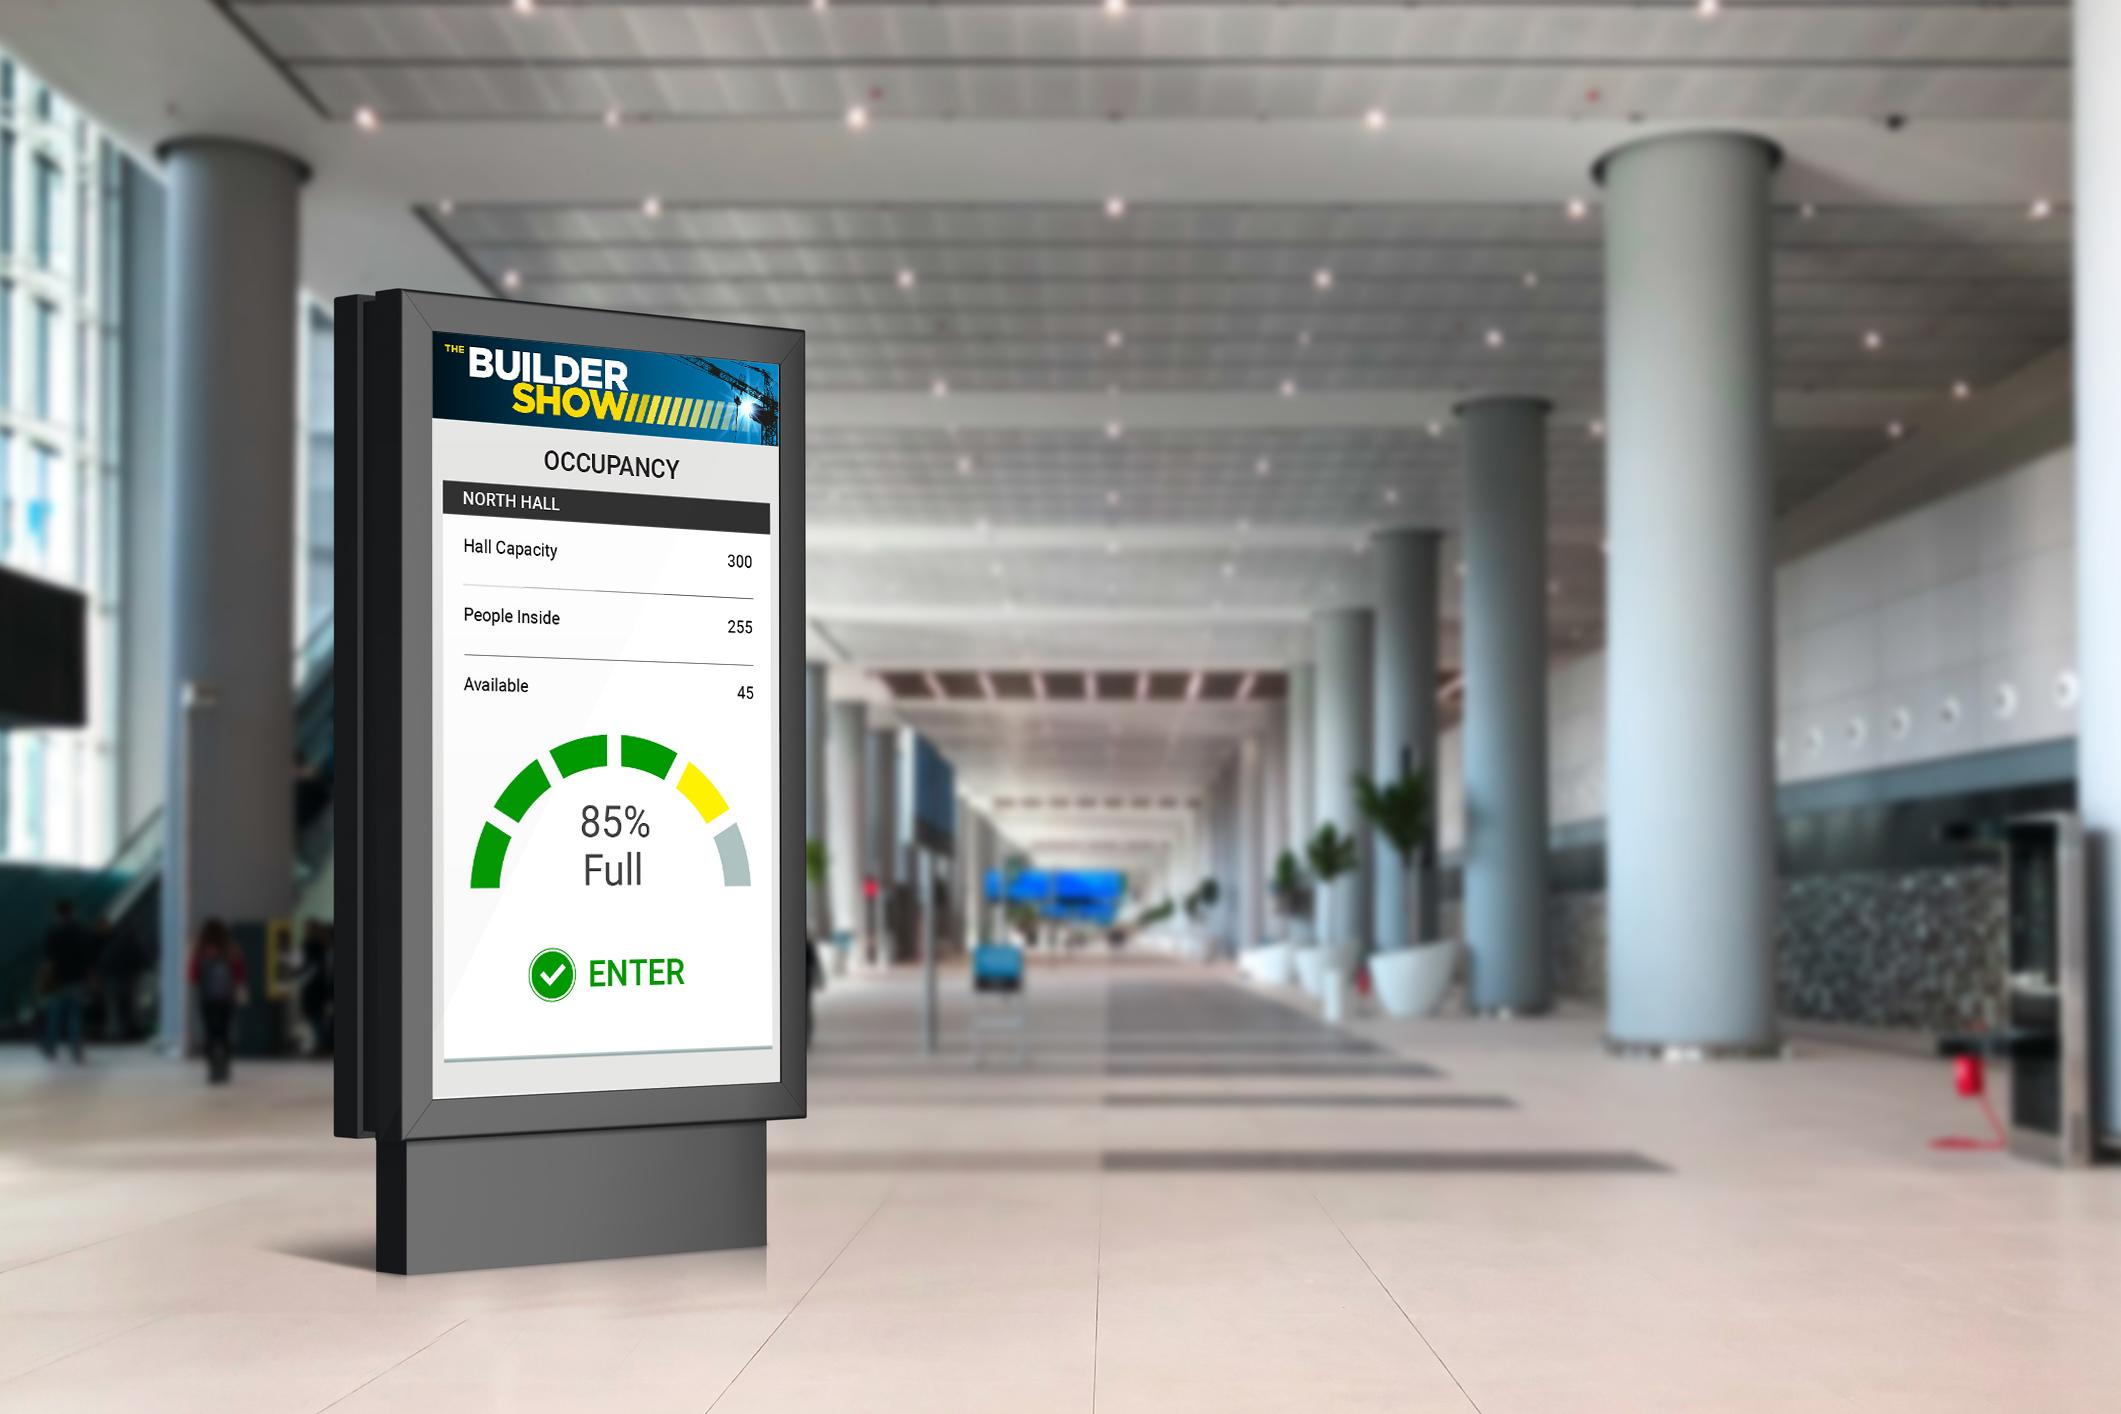 digital display mockup 1 hall occupancy access control_08.17.20